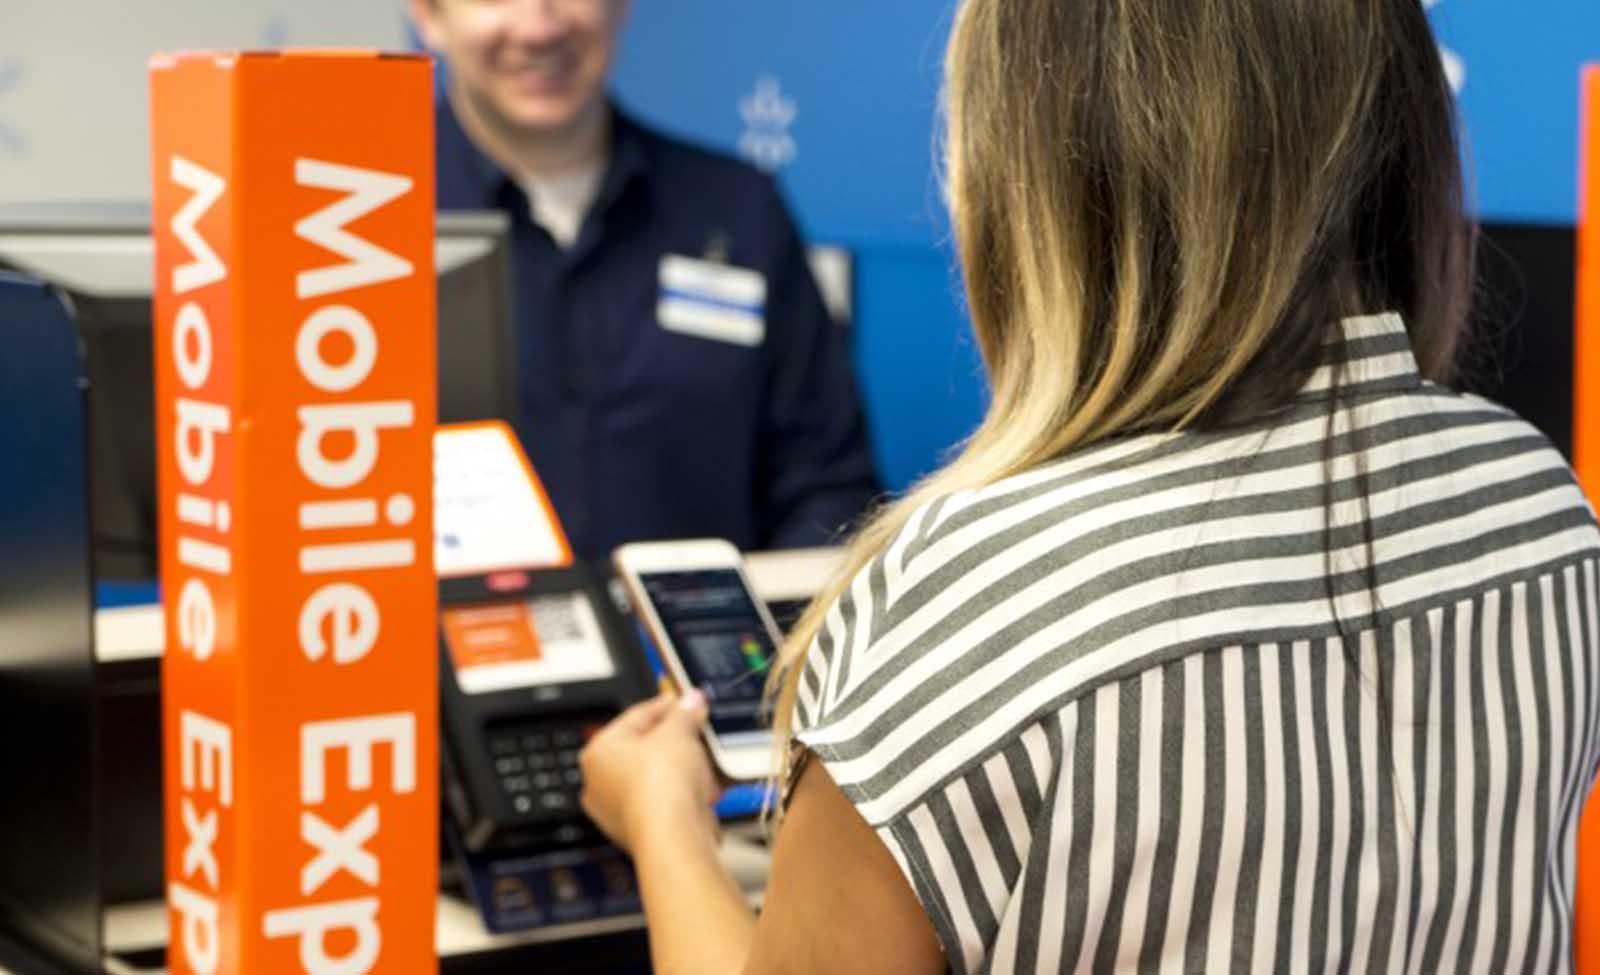 Walmart2world money transfer Walmart